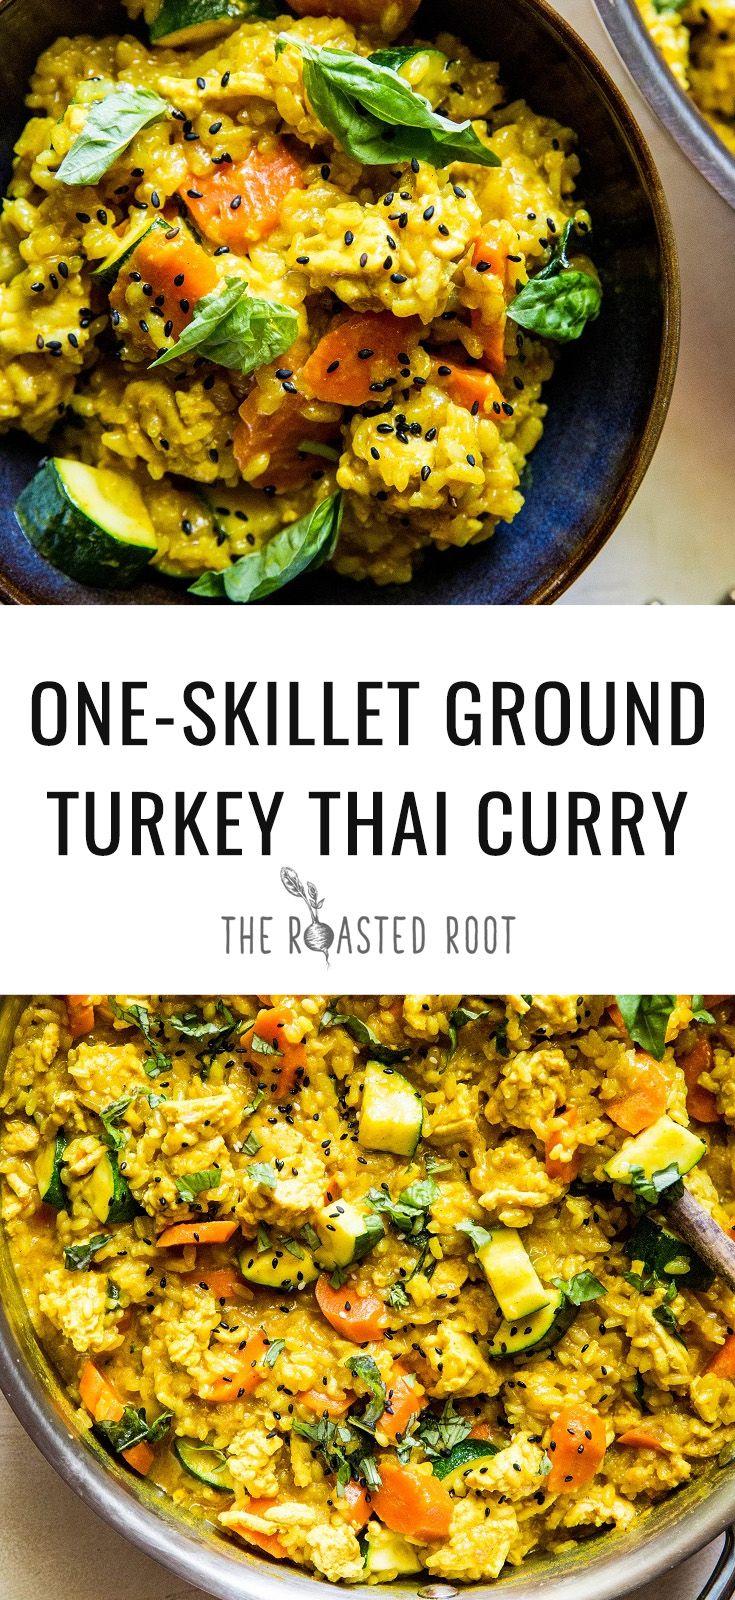 Photo of One-Skillet Ground Turkey Thai Curry